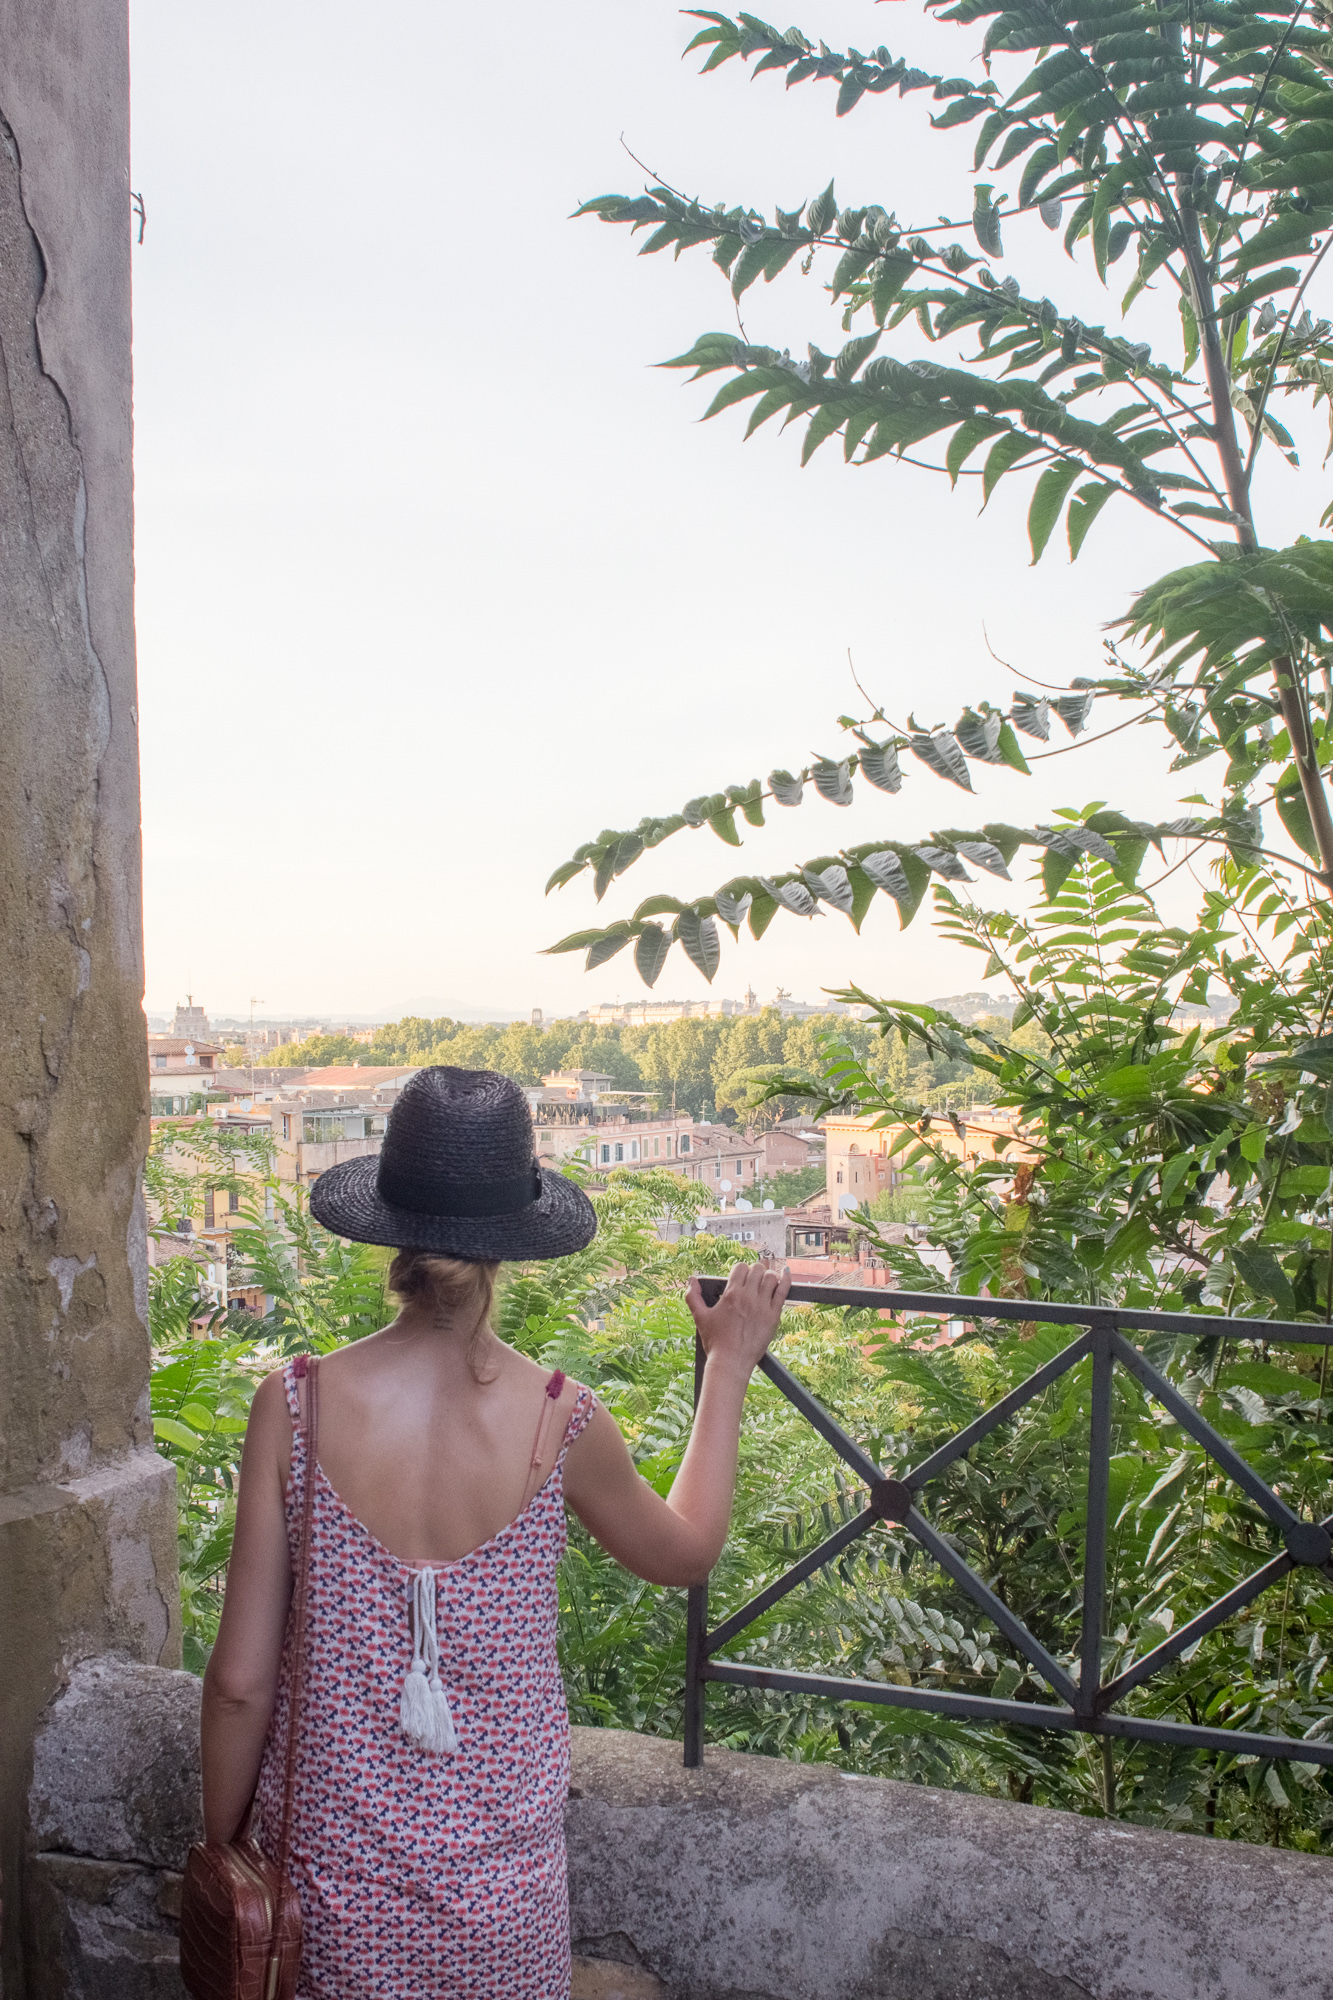 Regard sur la ville de Rome, colline du Janicule, Italie